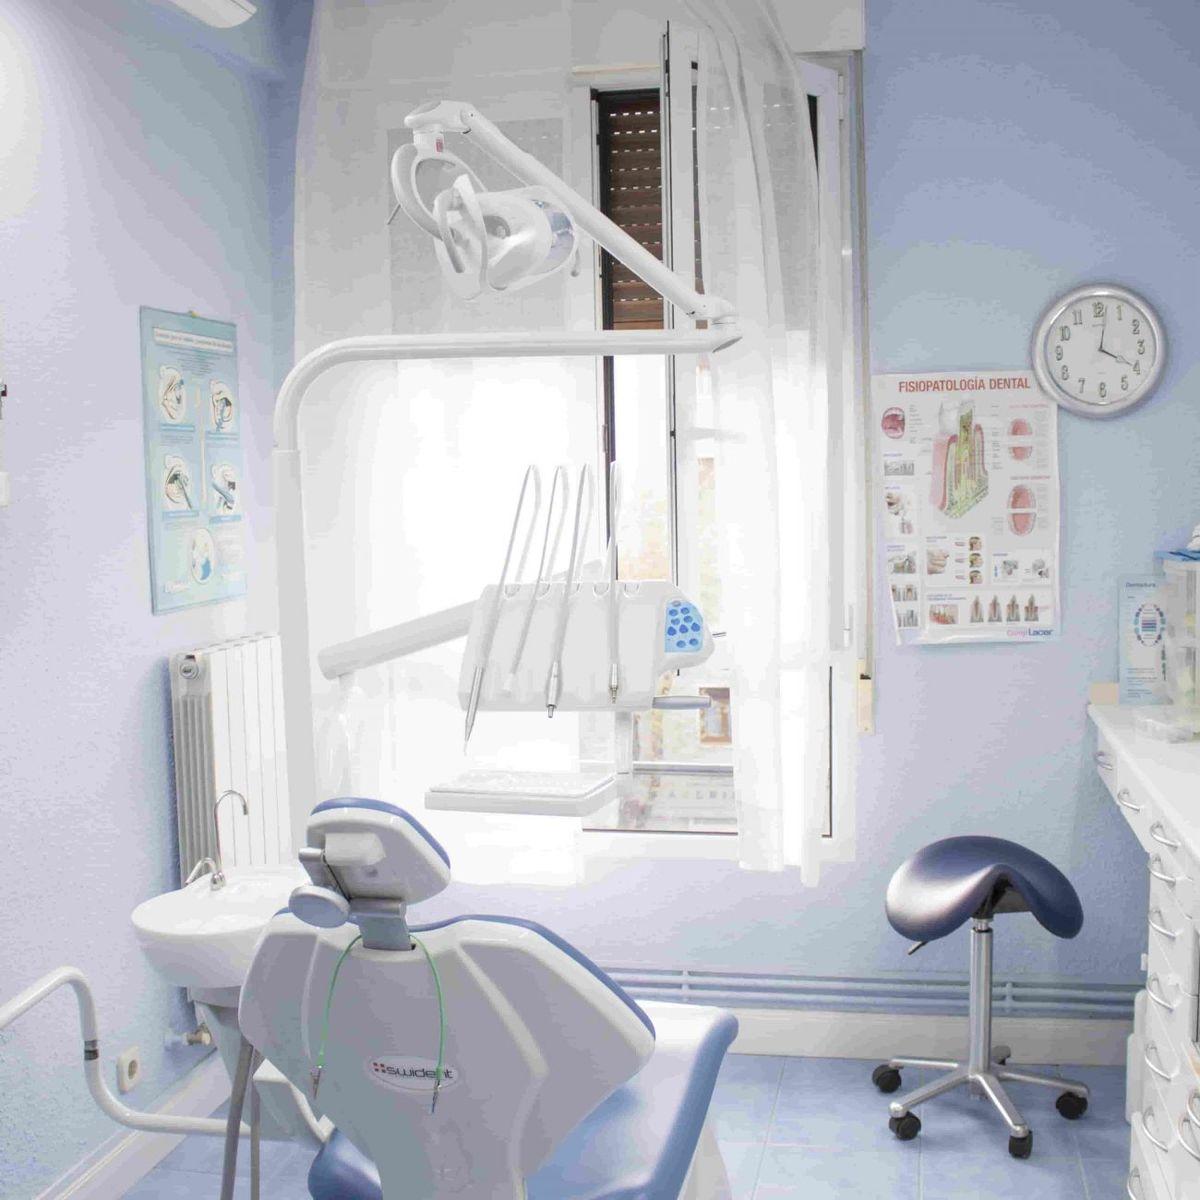 Clínica dental Maria Jose Cadiñanos en San Ignacio